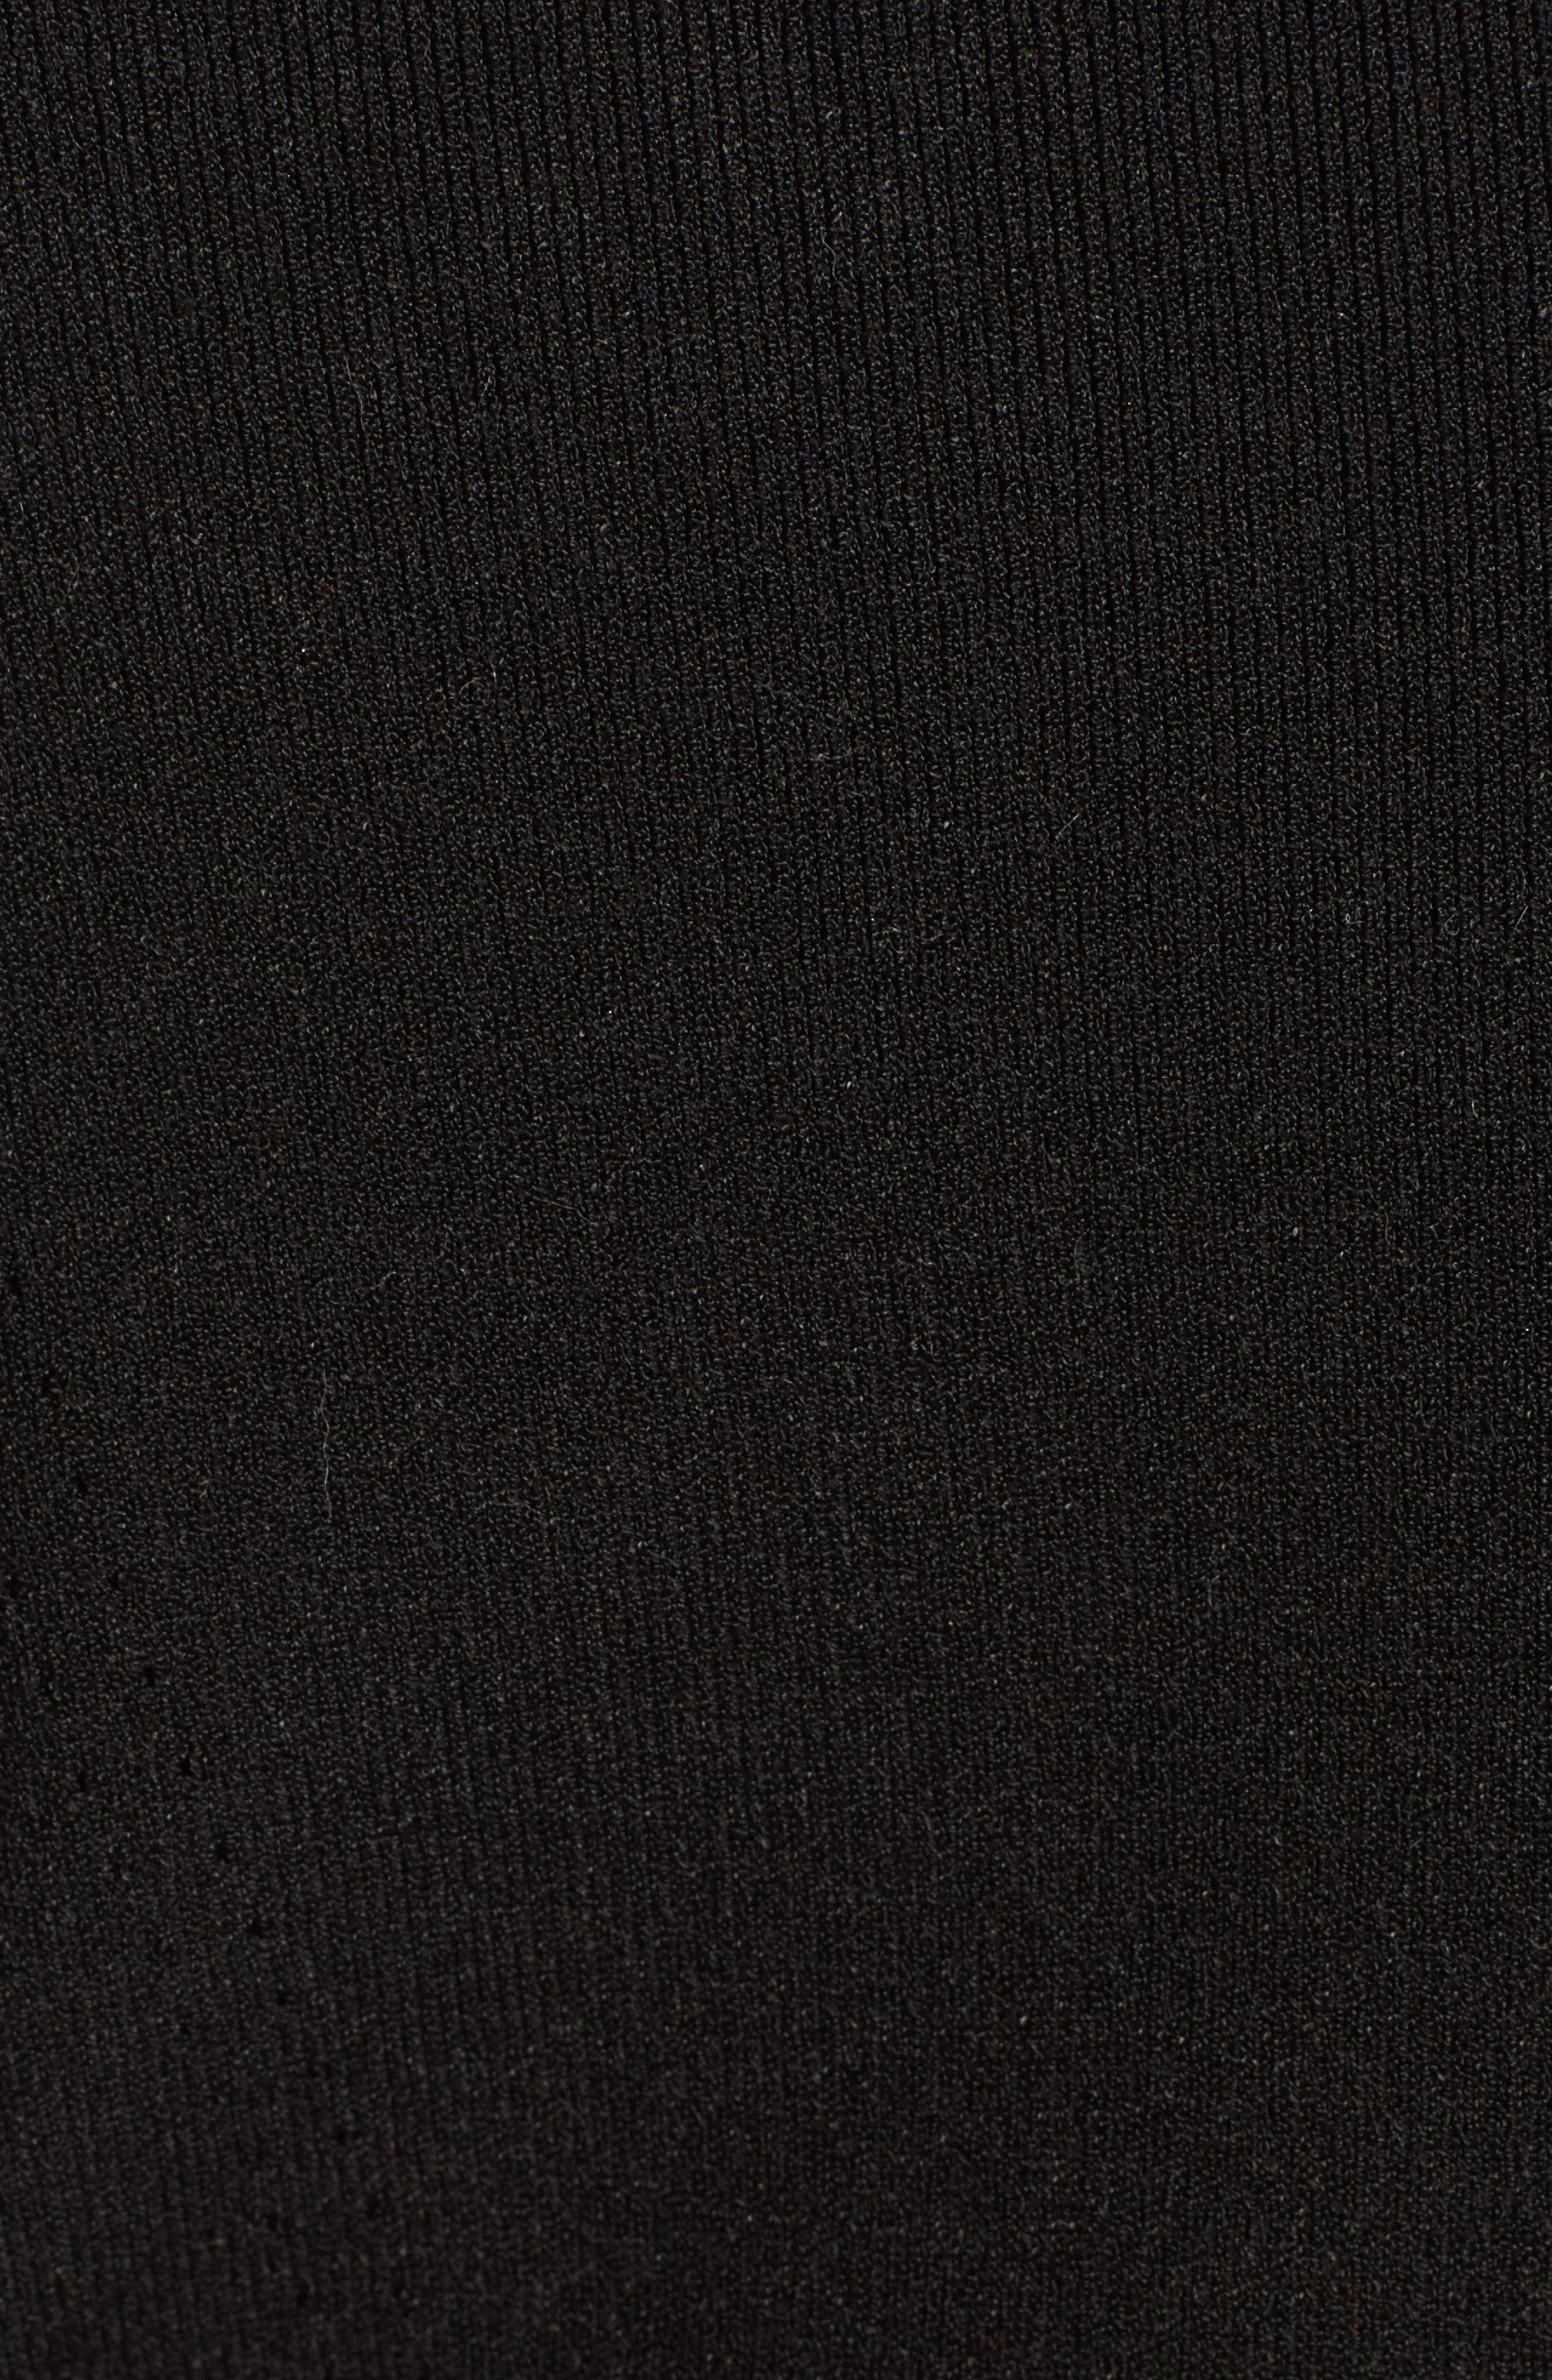 Macramé Inset Knit Dress,                             Alternate thumbnail 5, color,                             001